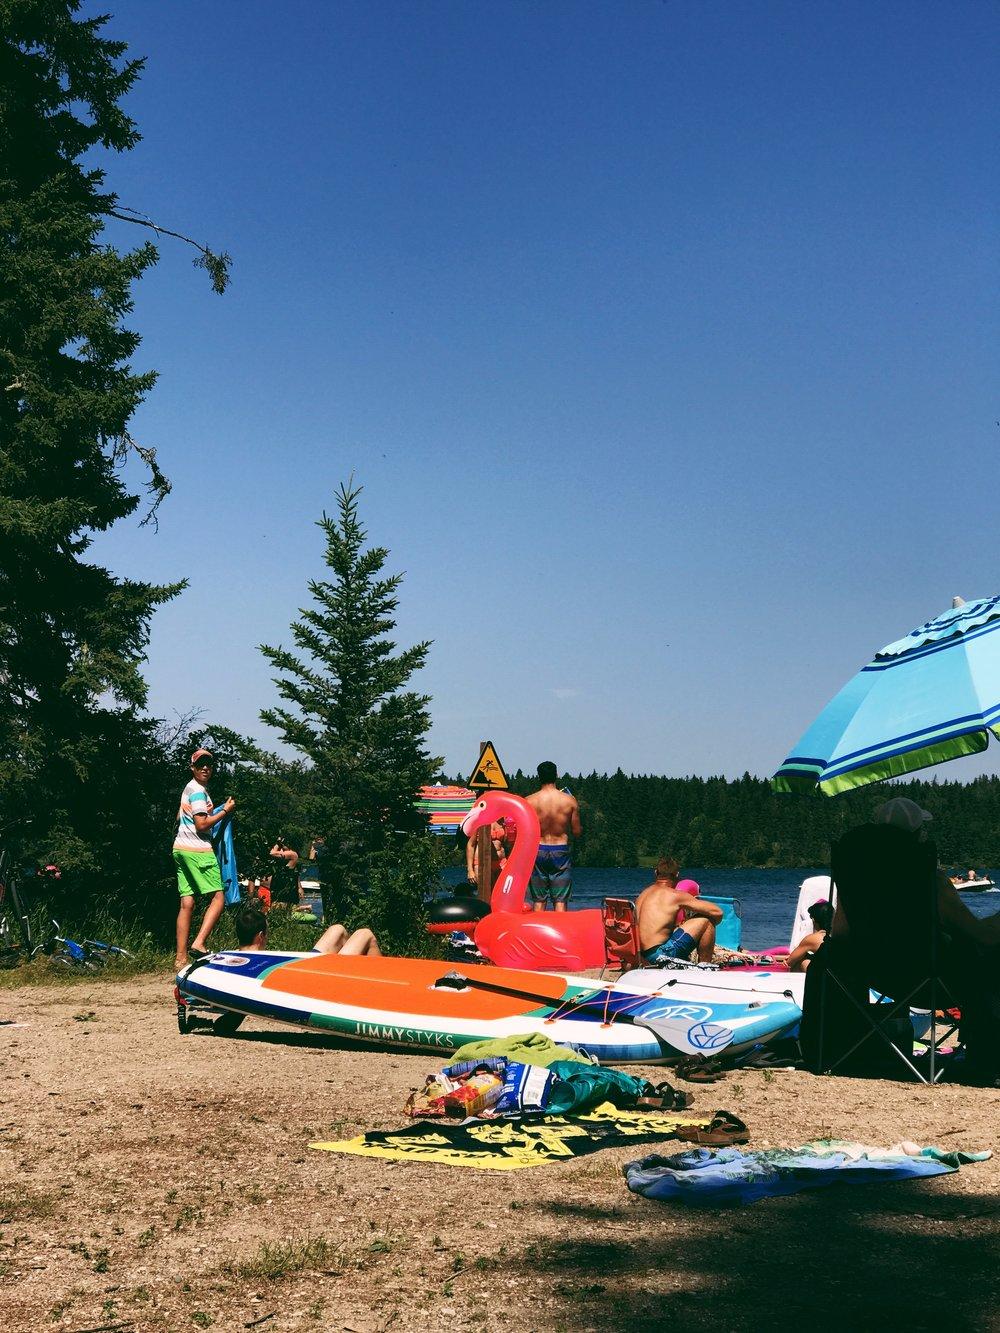 deepbay-clear-lake-riding-mountain-national-park.JPG